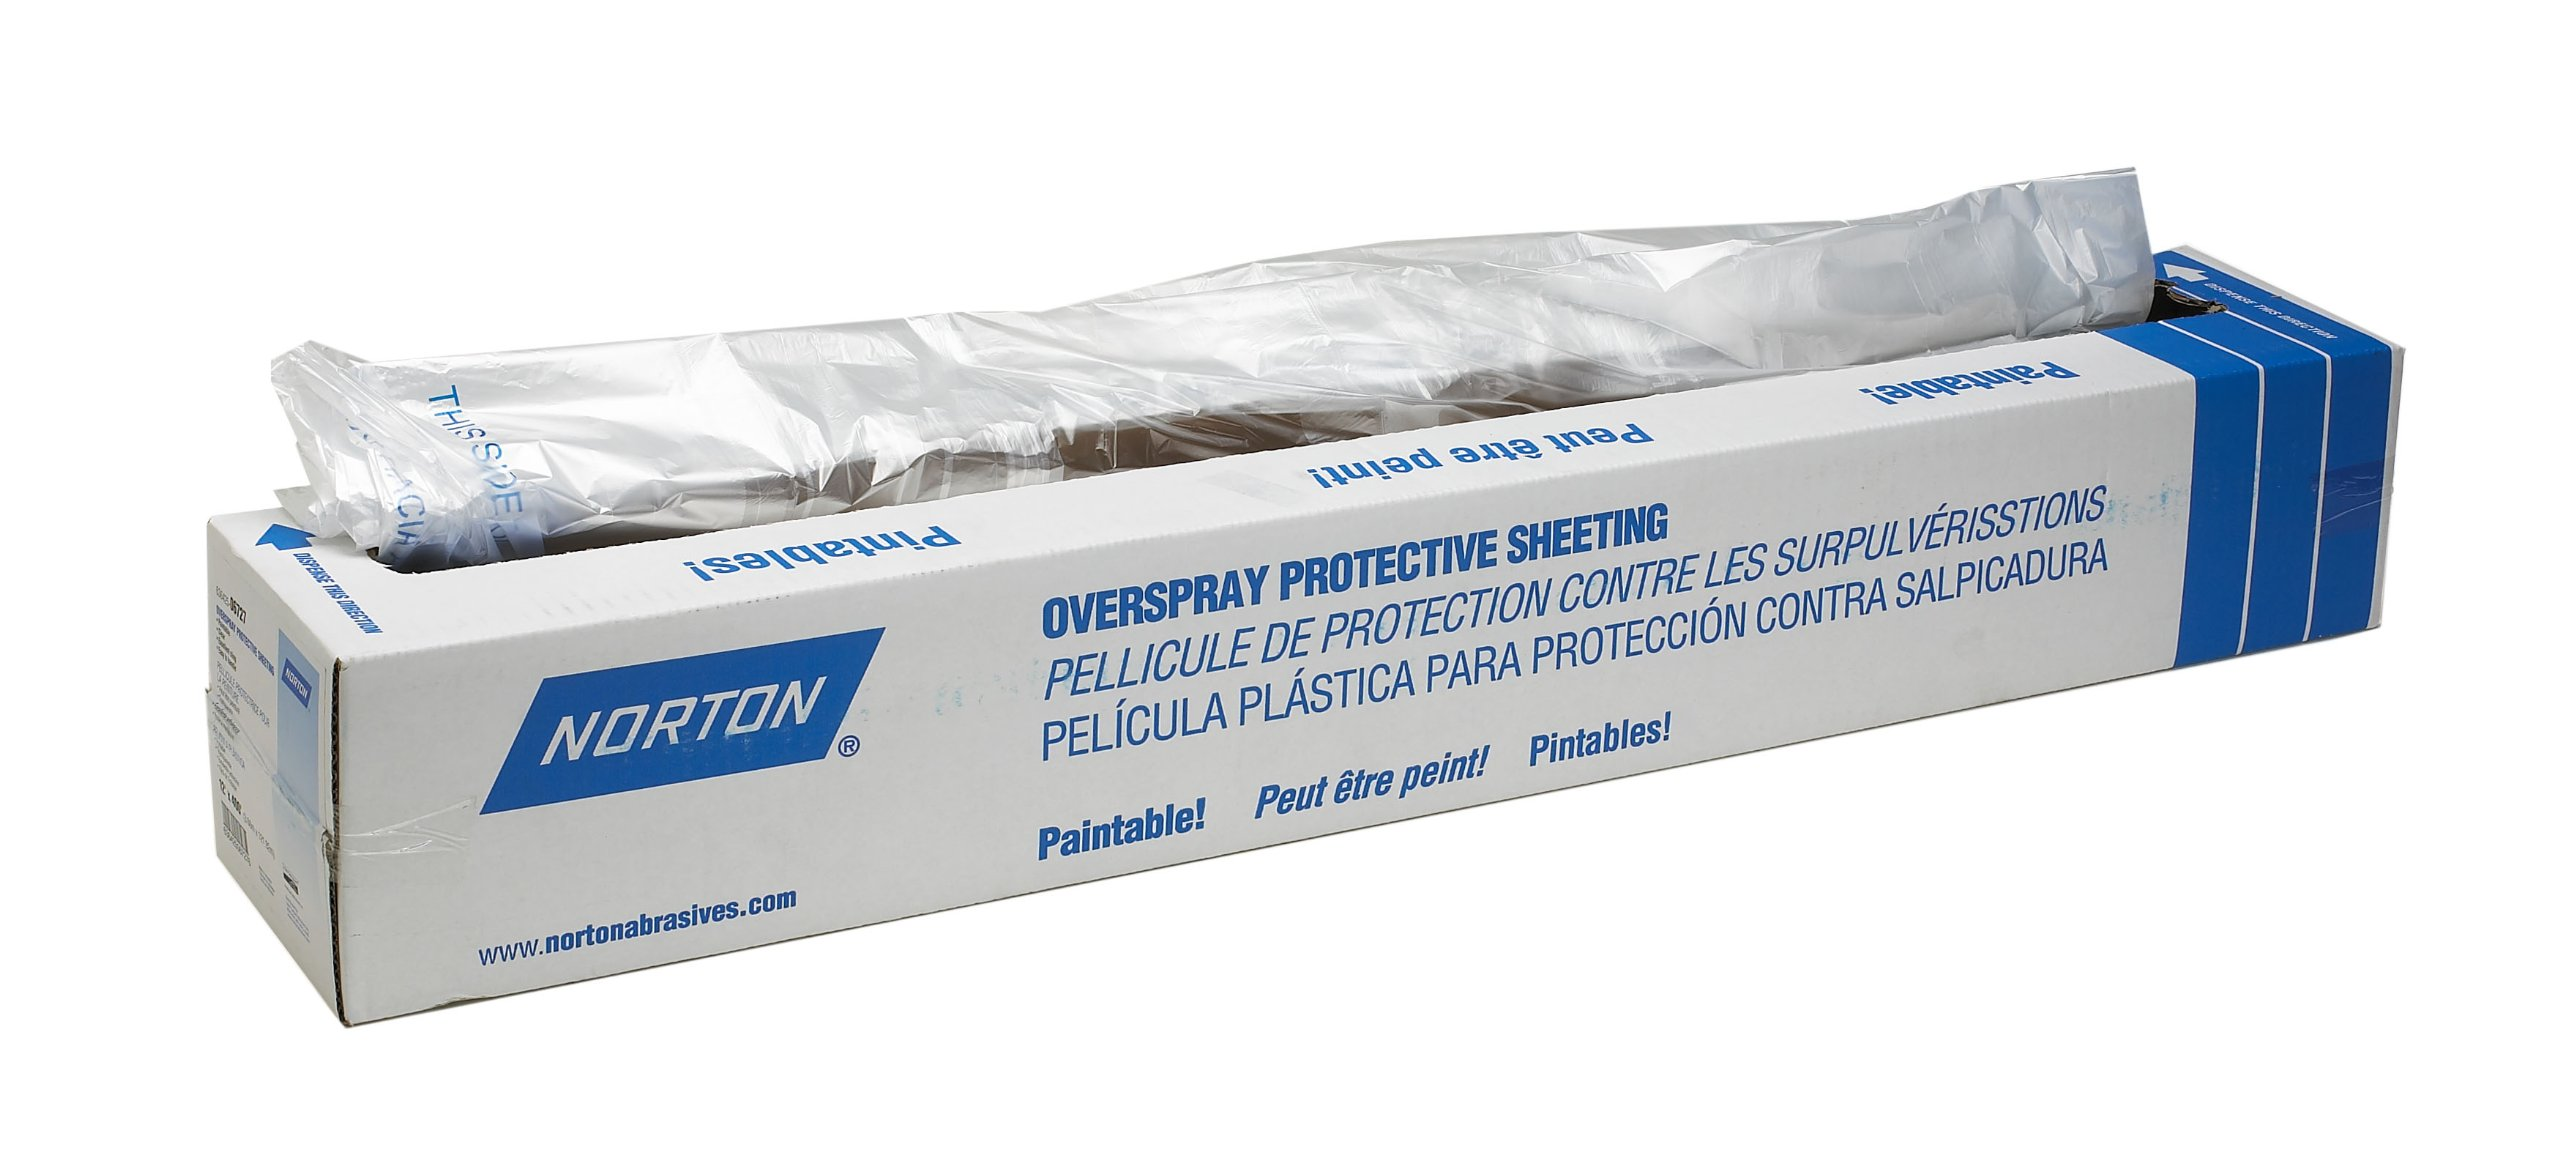 Norton 636425-06728 16' x 400' Overspray Protective Sheeting by Norton